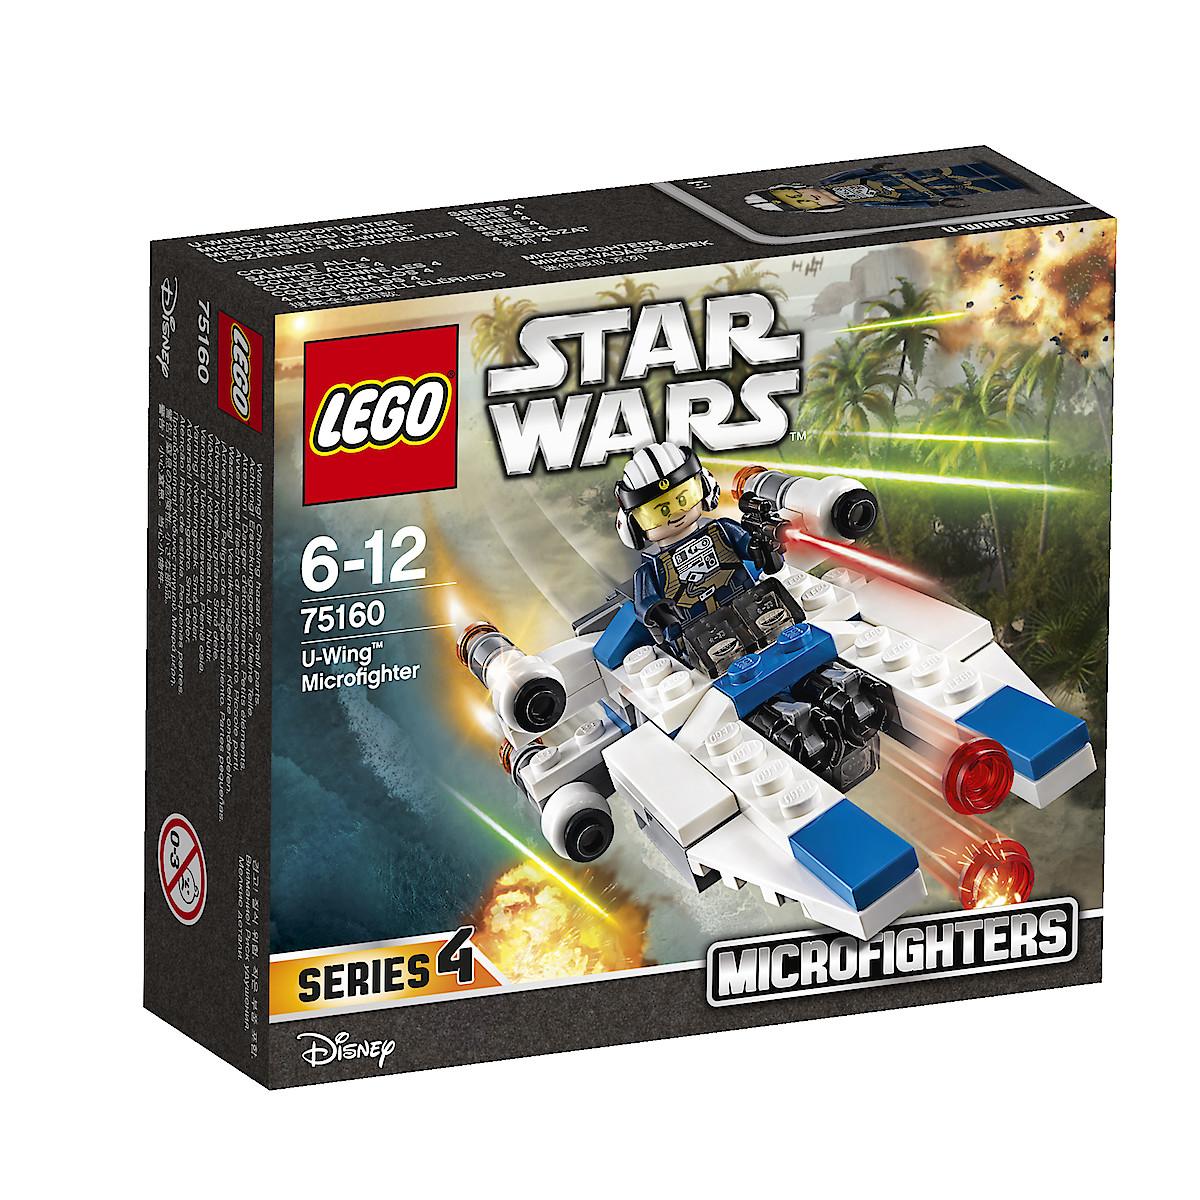 LEGO Star Wars 75160, U-Wing Microfighter